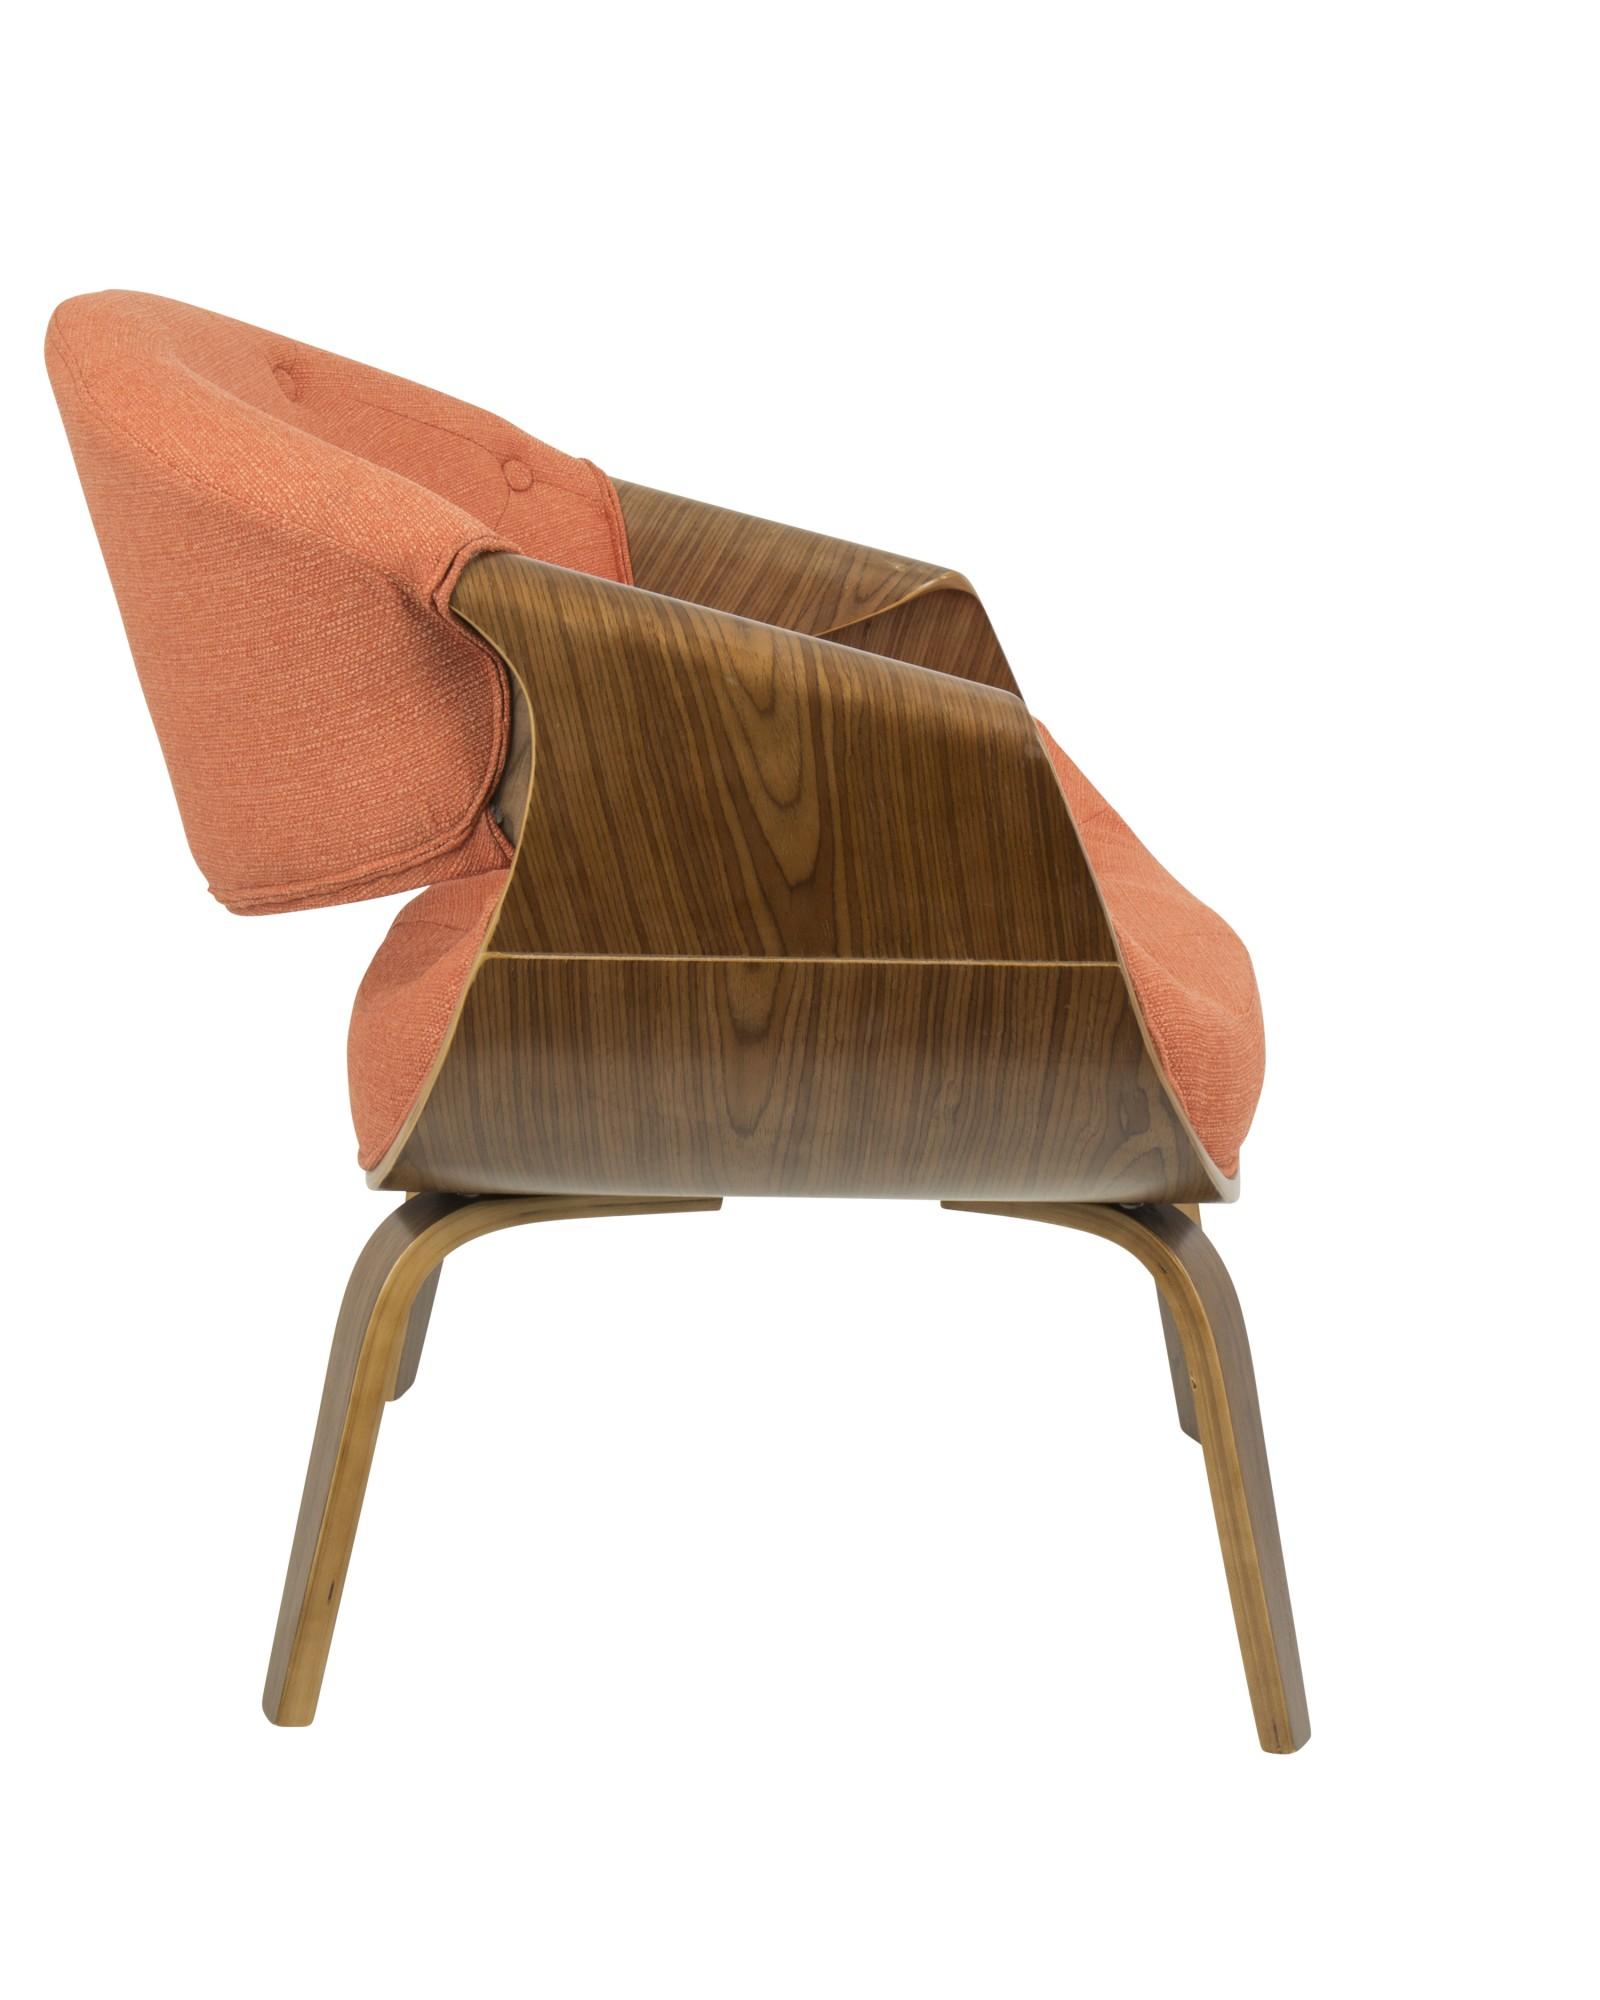 Curvo Mid-Century Modern Tufted Accent Chair in Walnut and Orange Fabric